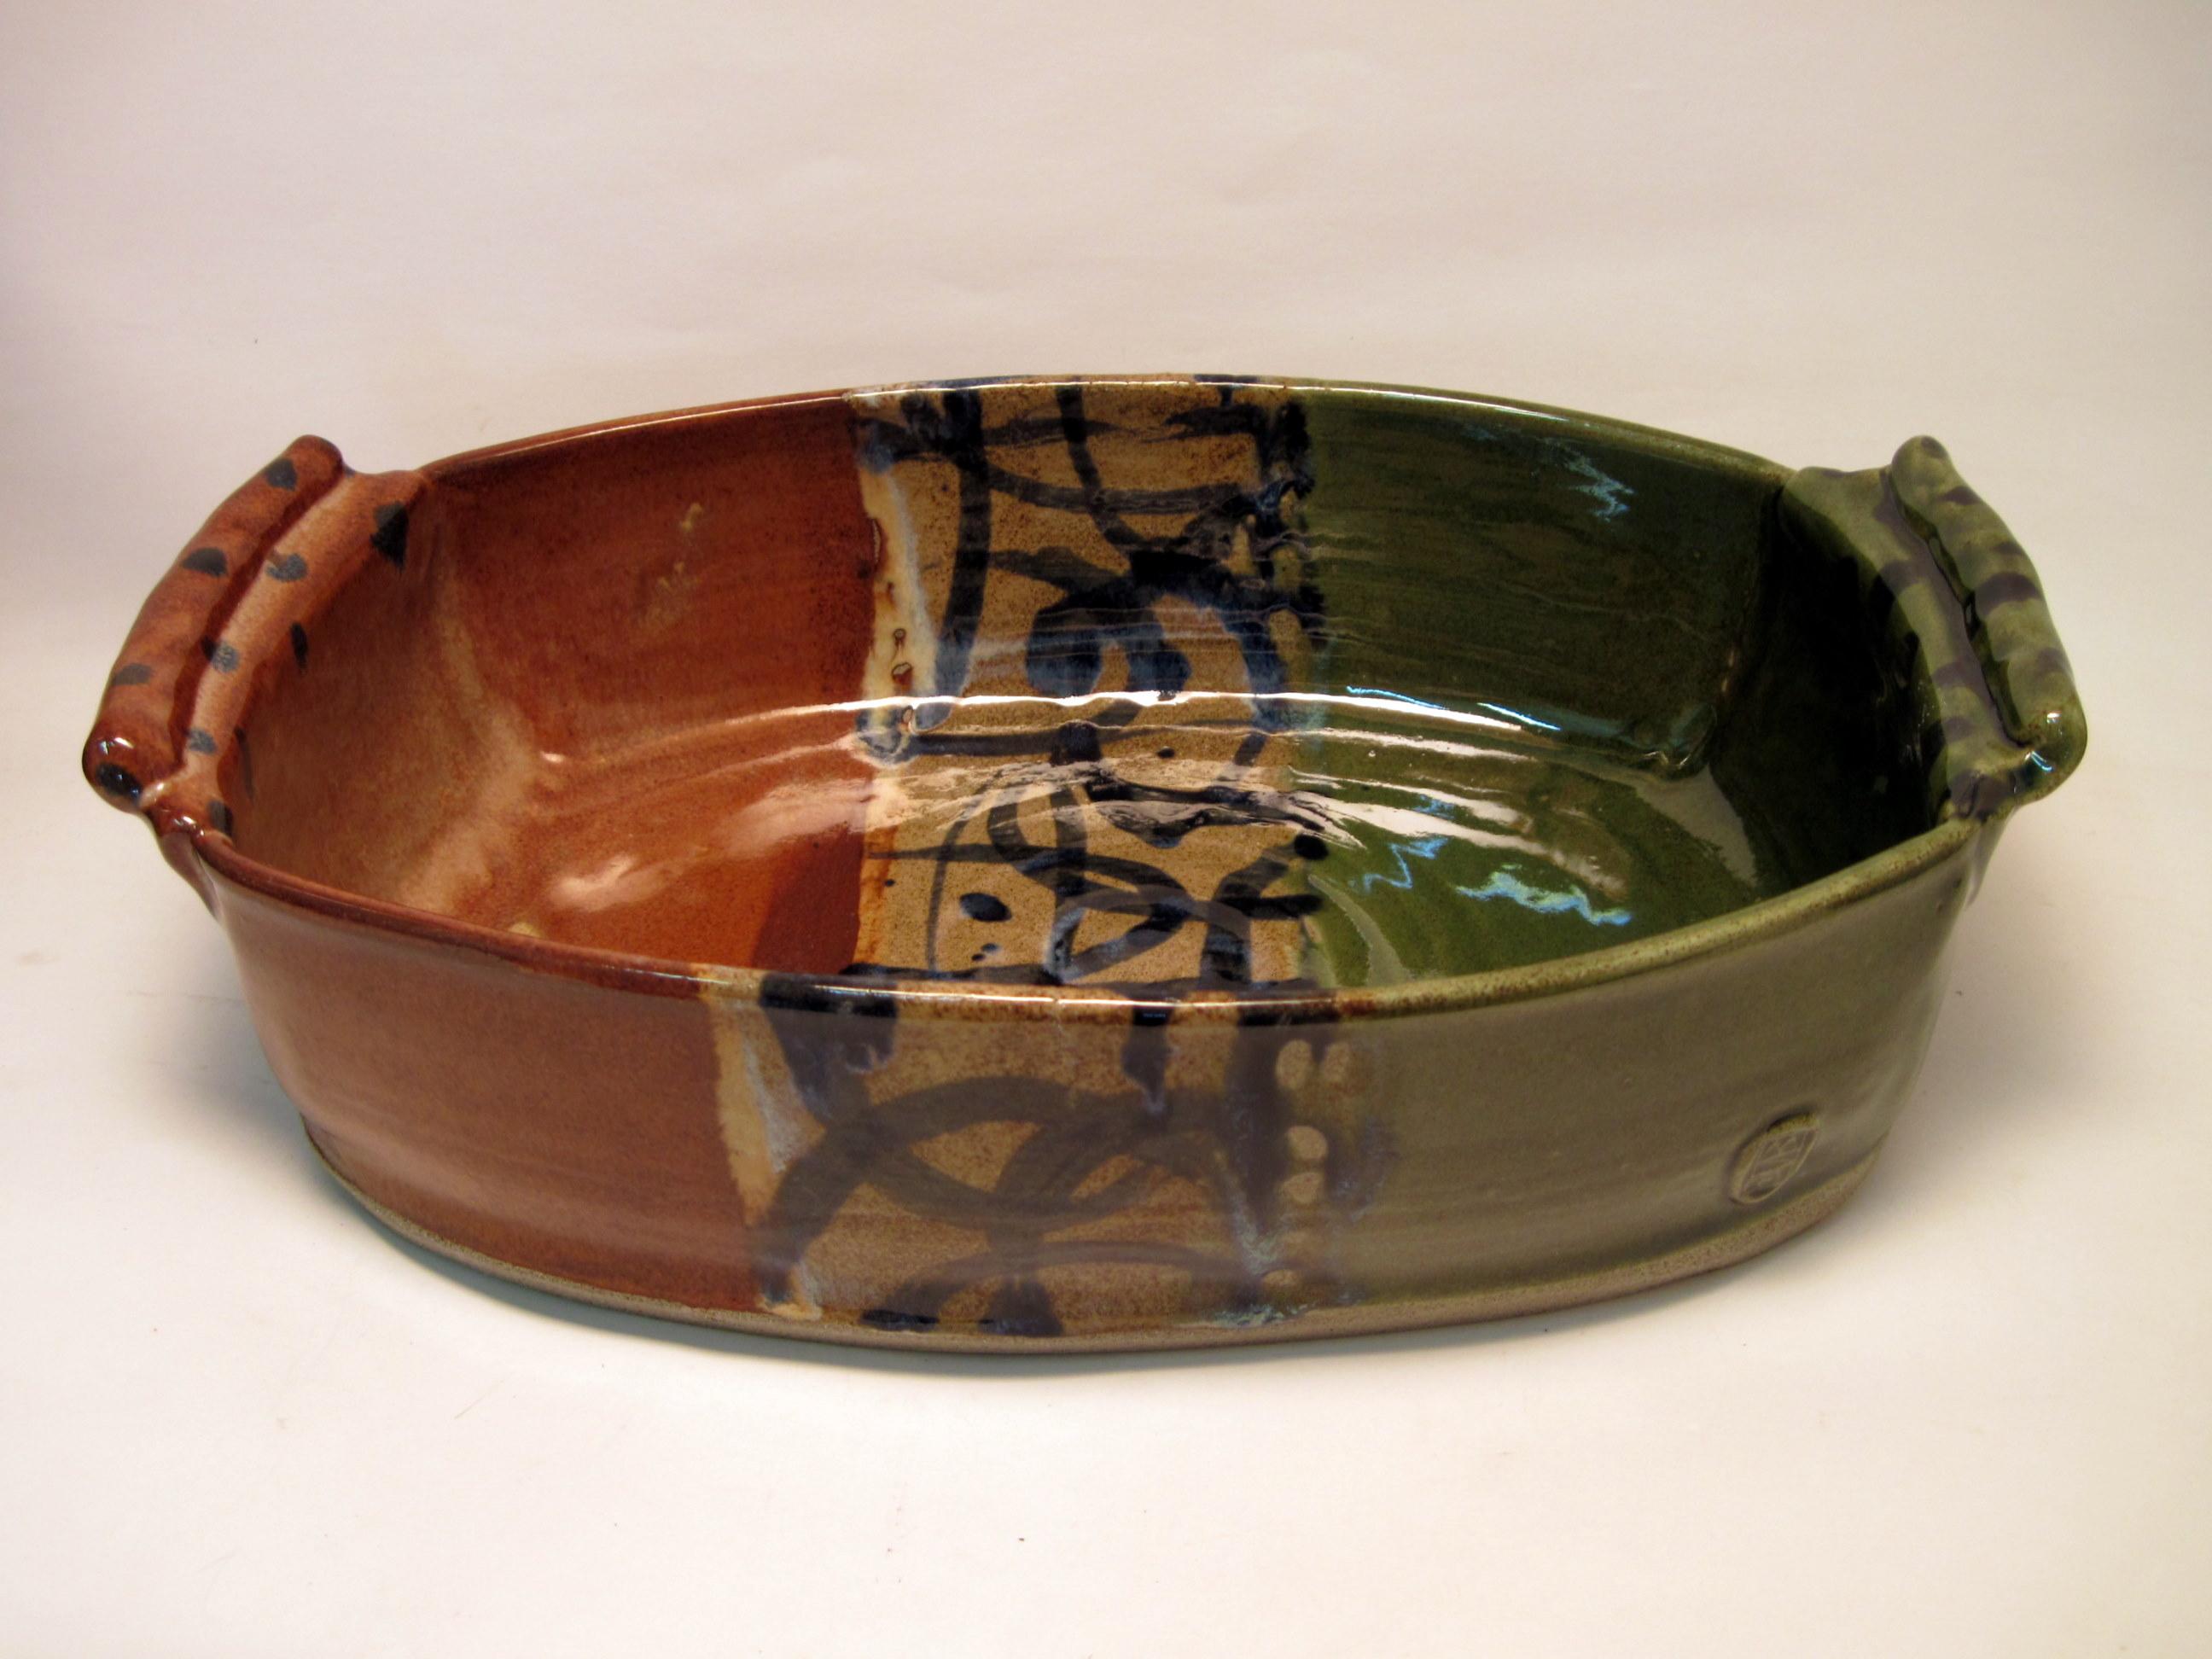 Stoneware cassorole